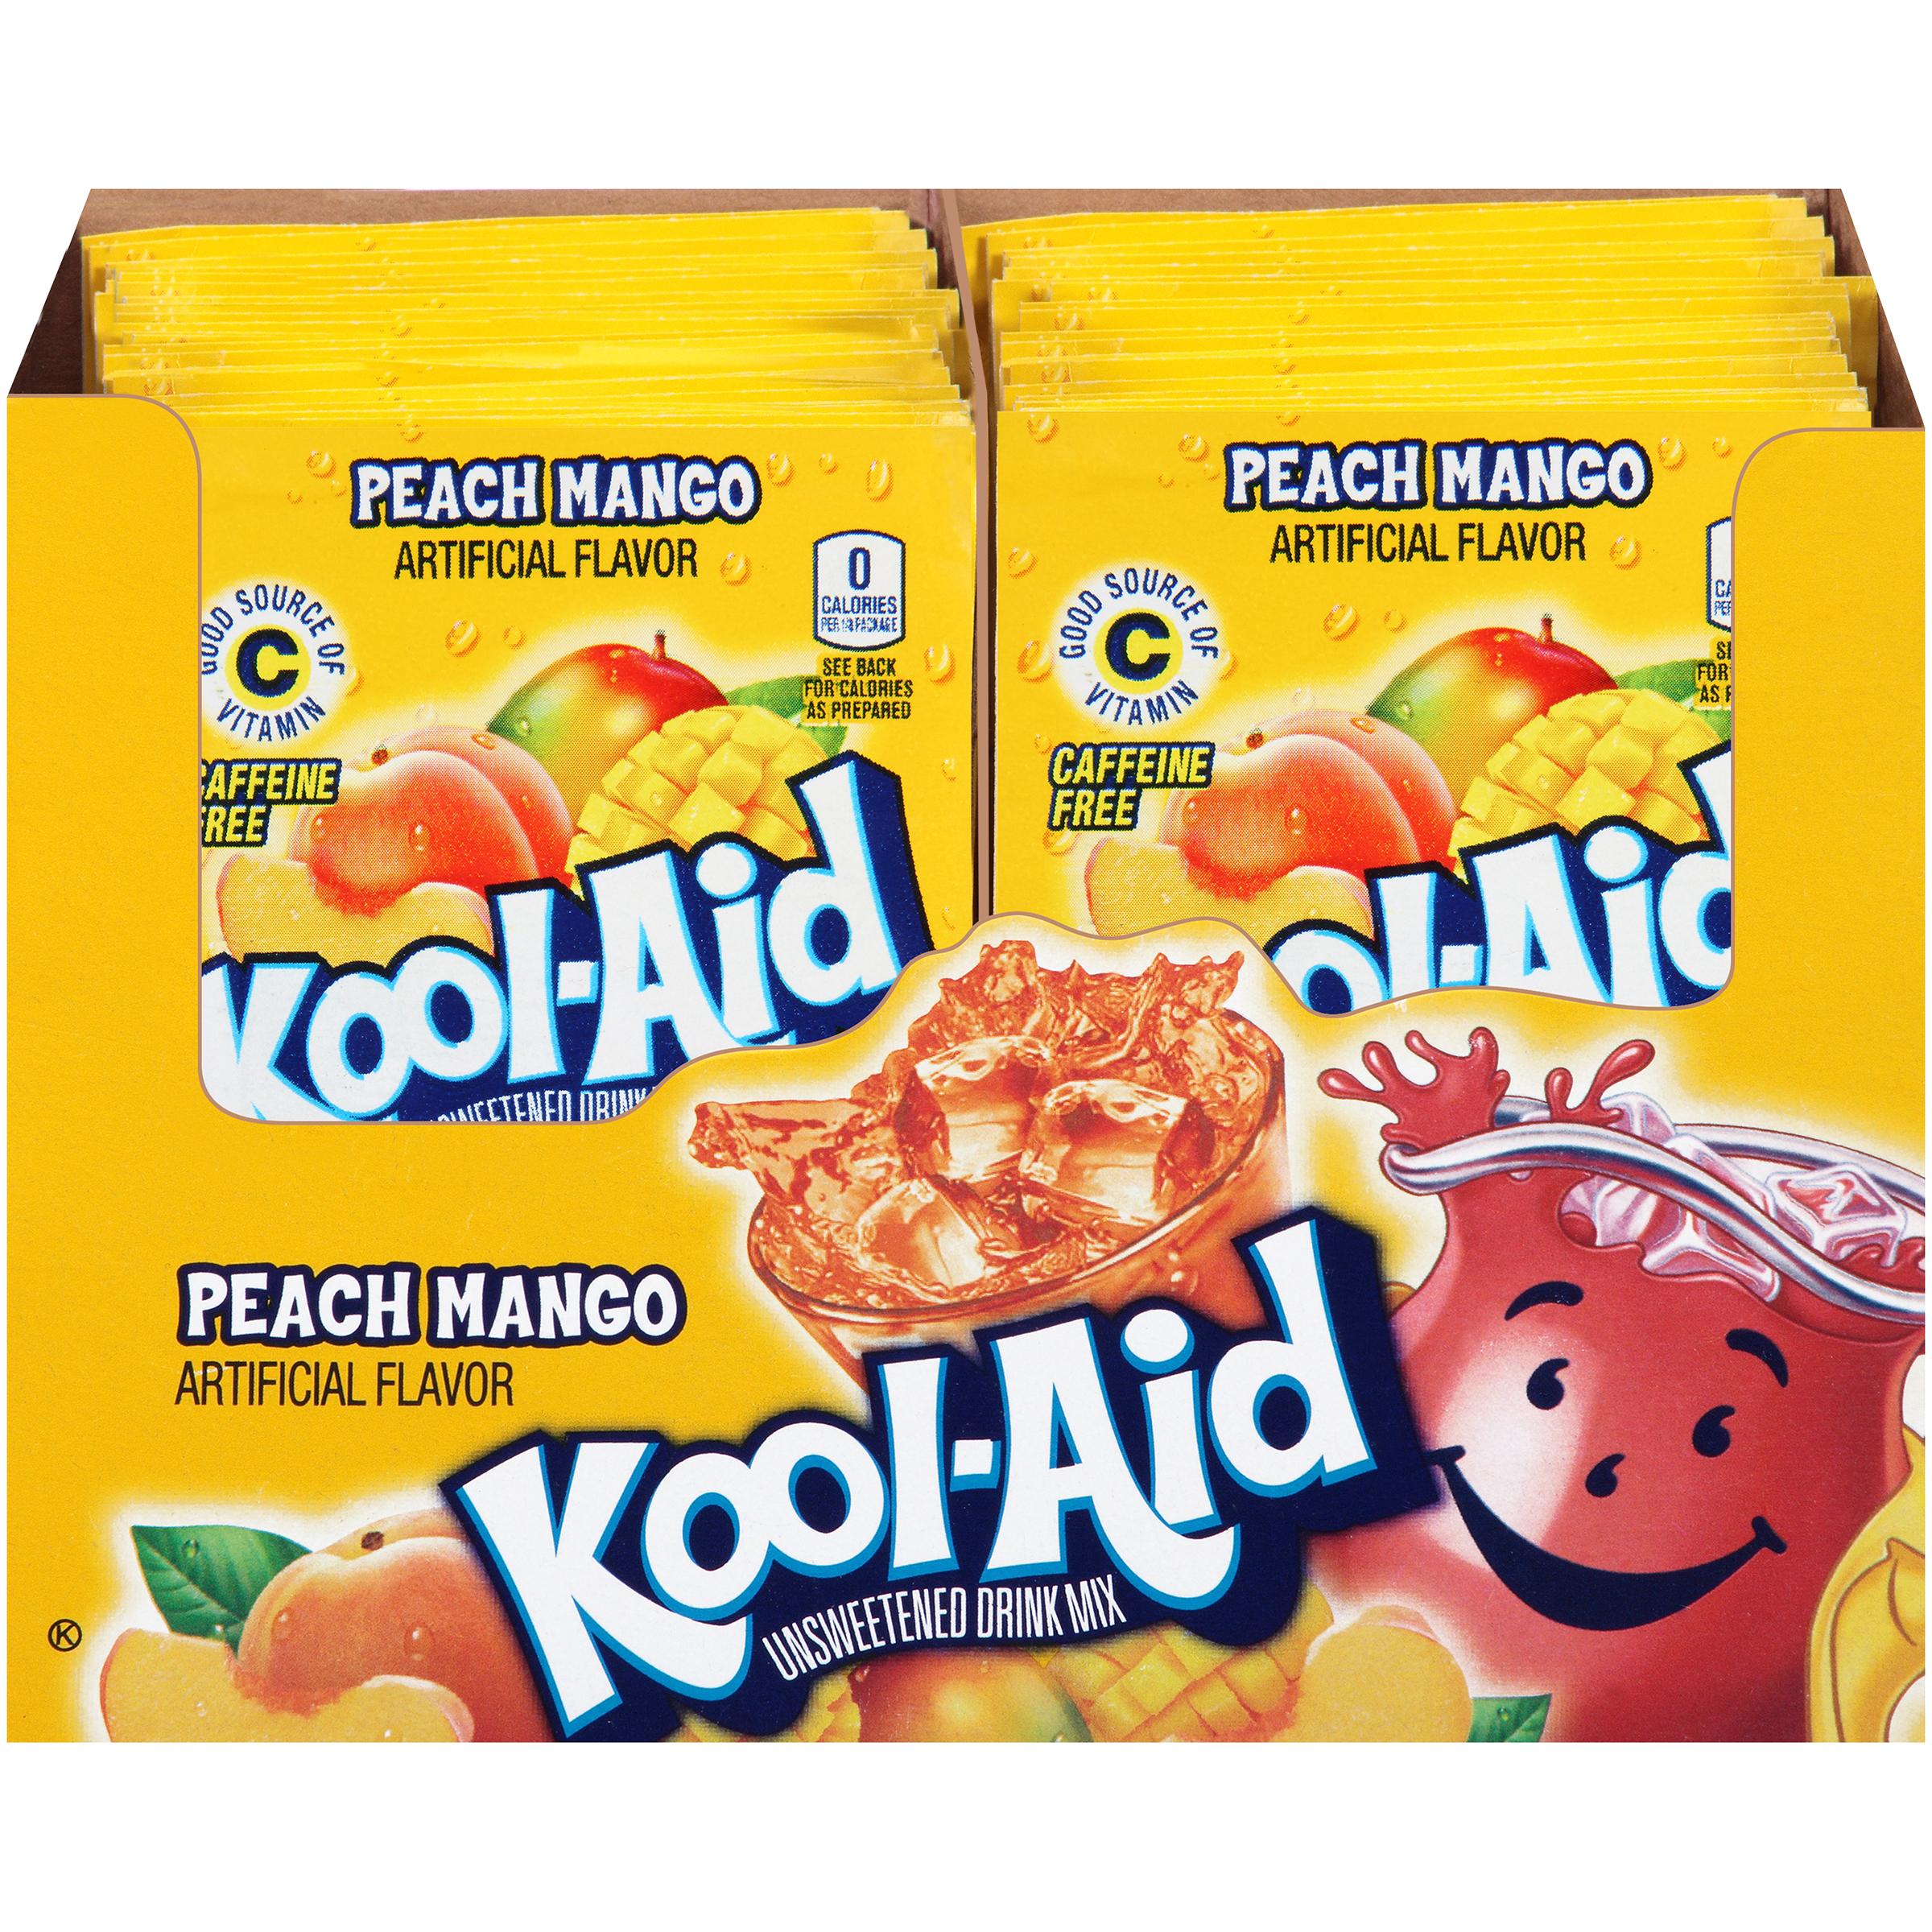 KOOL-AID Peach Mango Drink Mix 0.14 oz Packet image